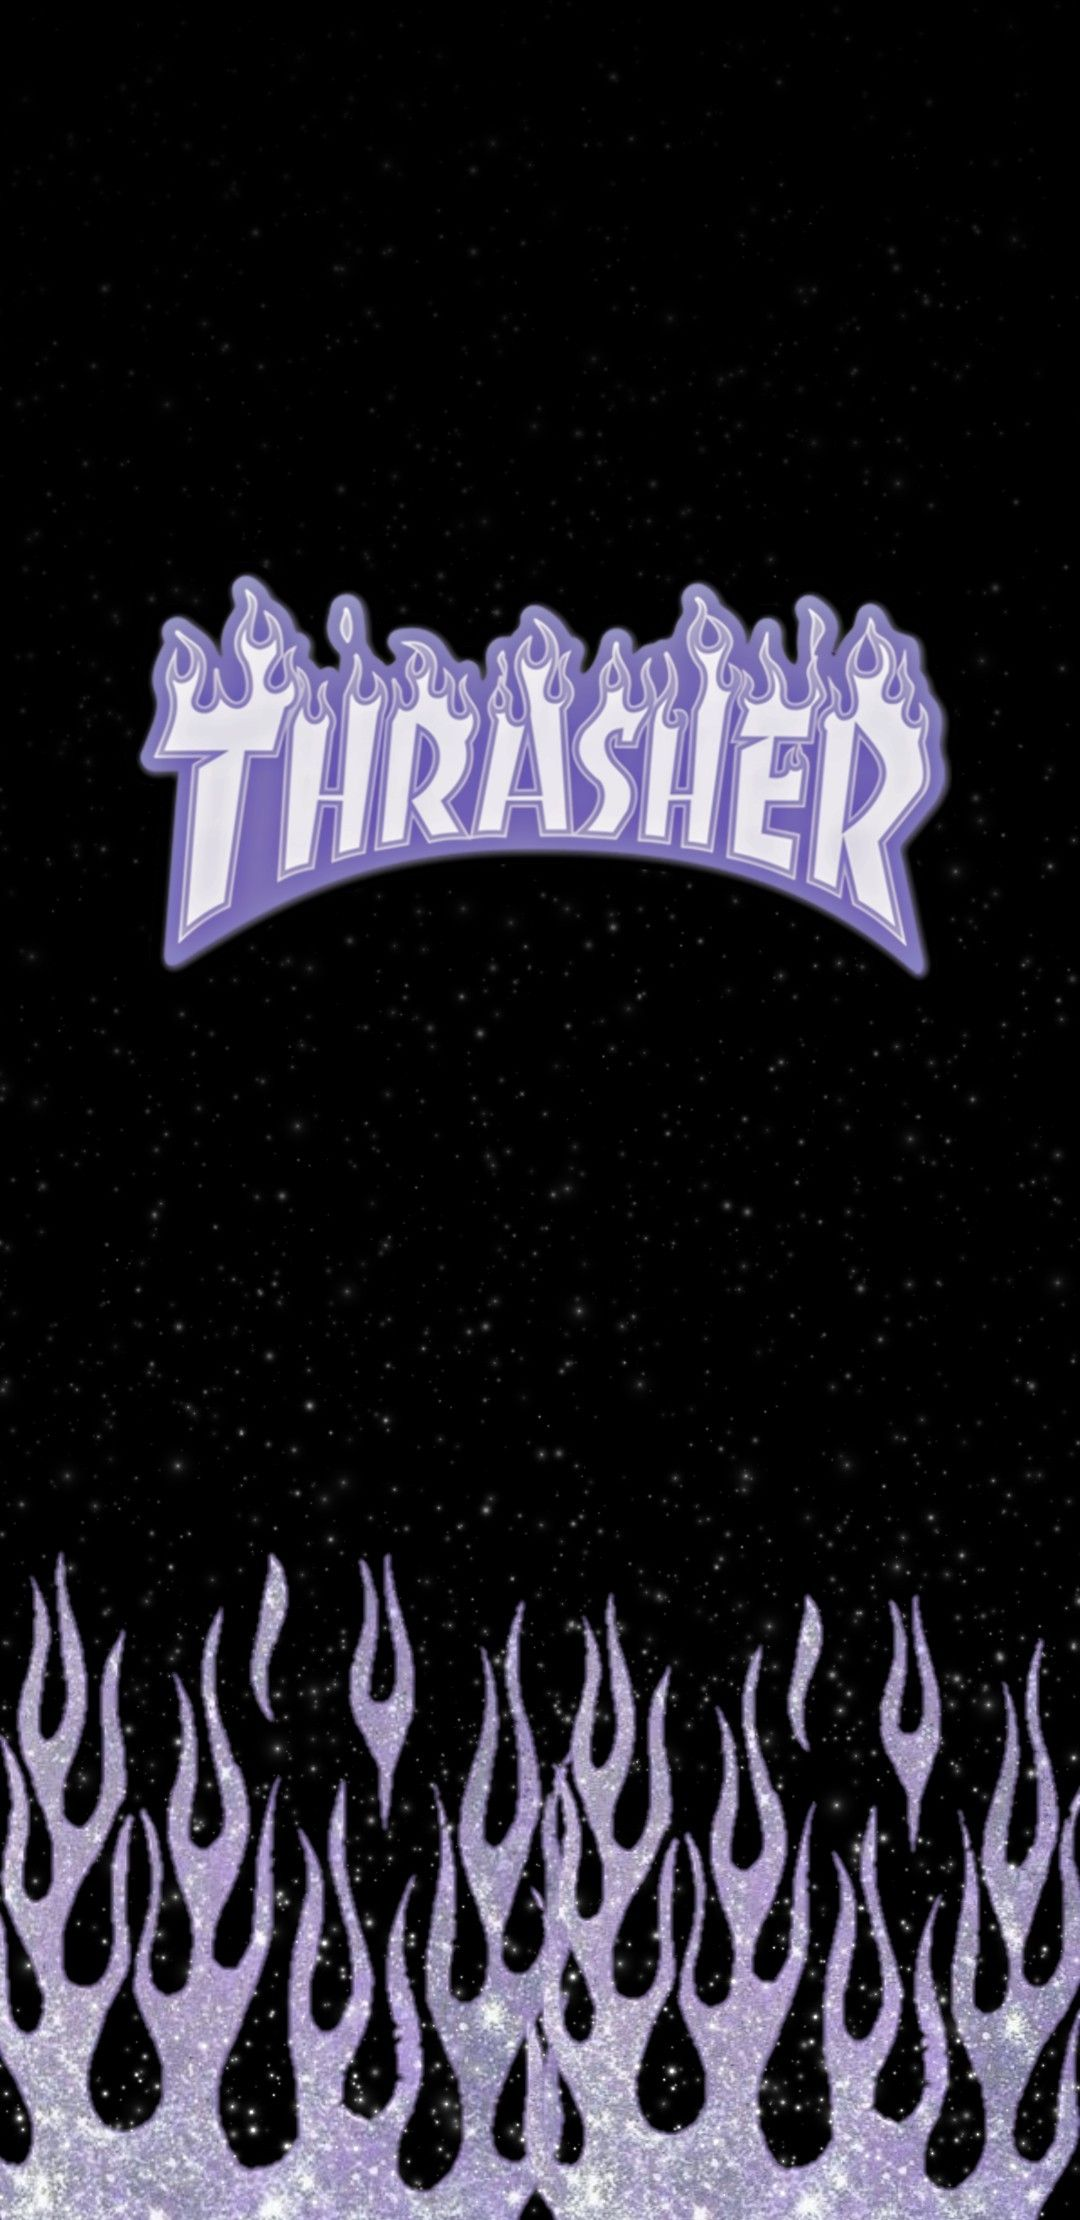 Purple Glitter Thrasher Iphone Wallpaper Pattern Purple Wallpaper Iphone Aesthetic Iphone Wallpaper